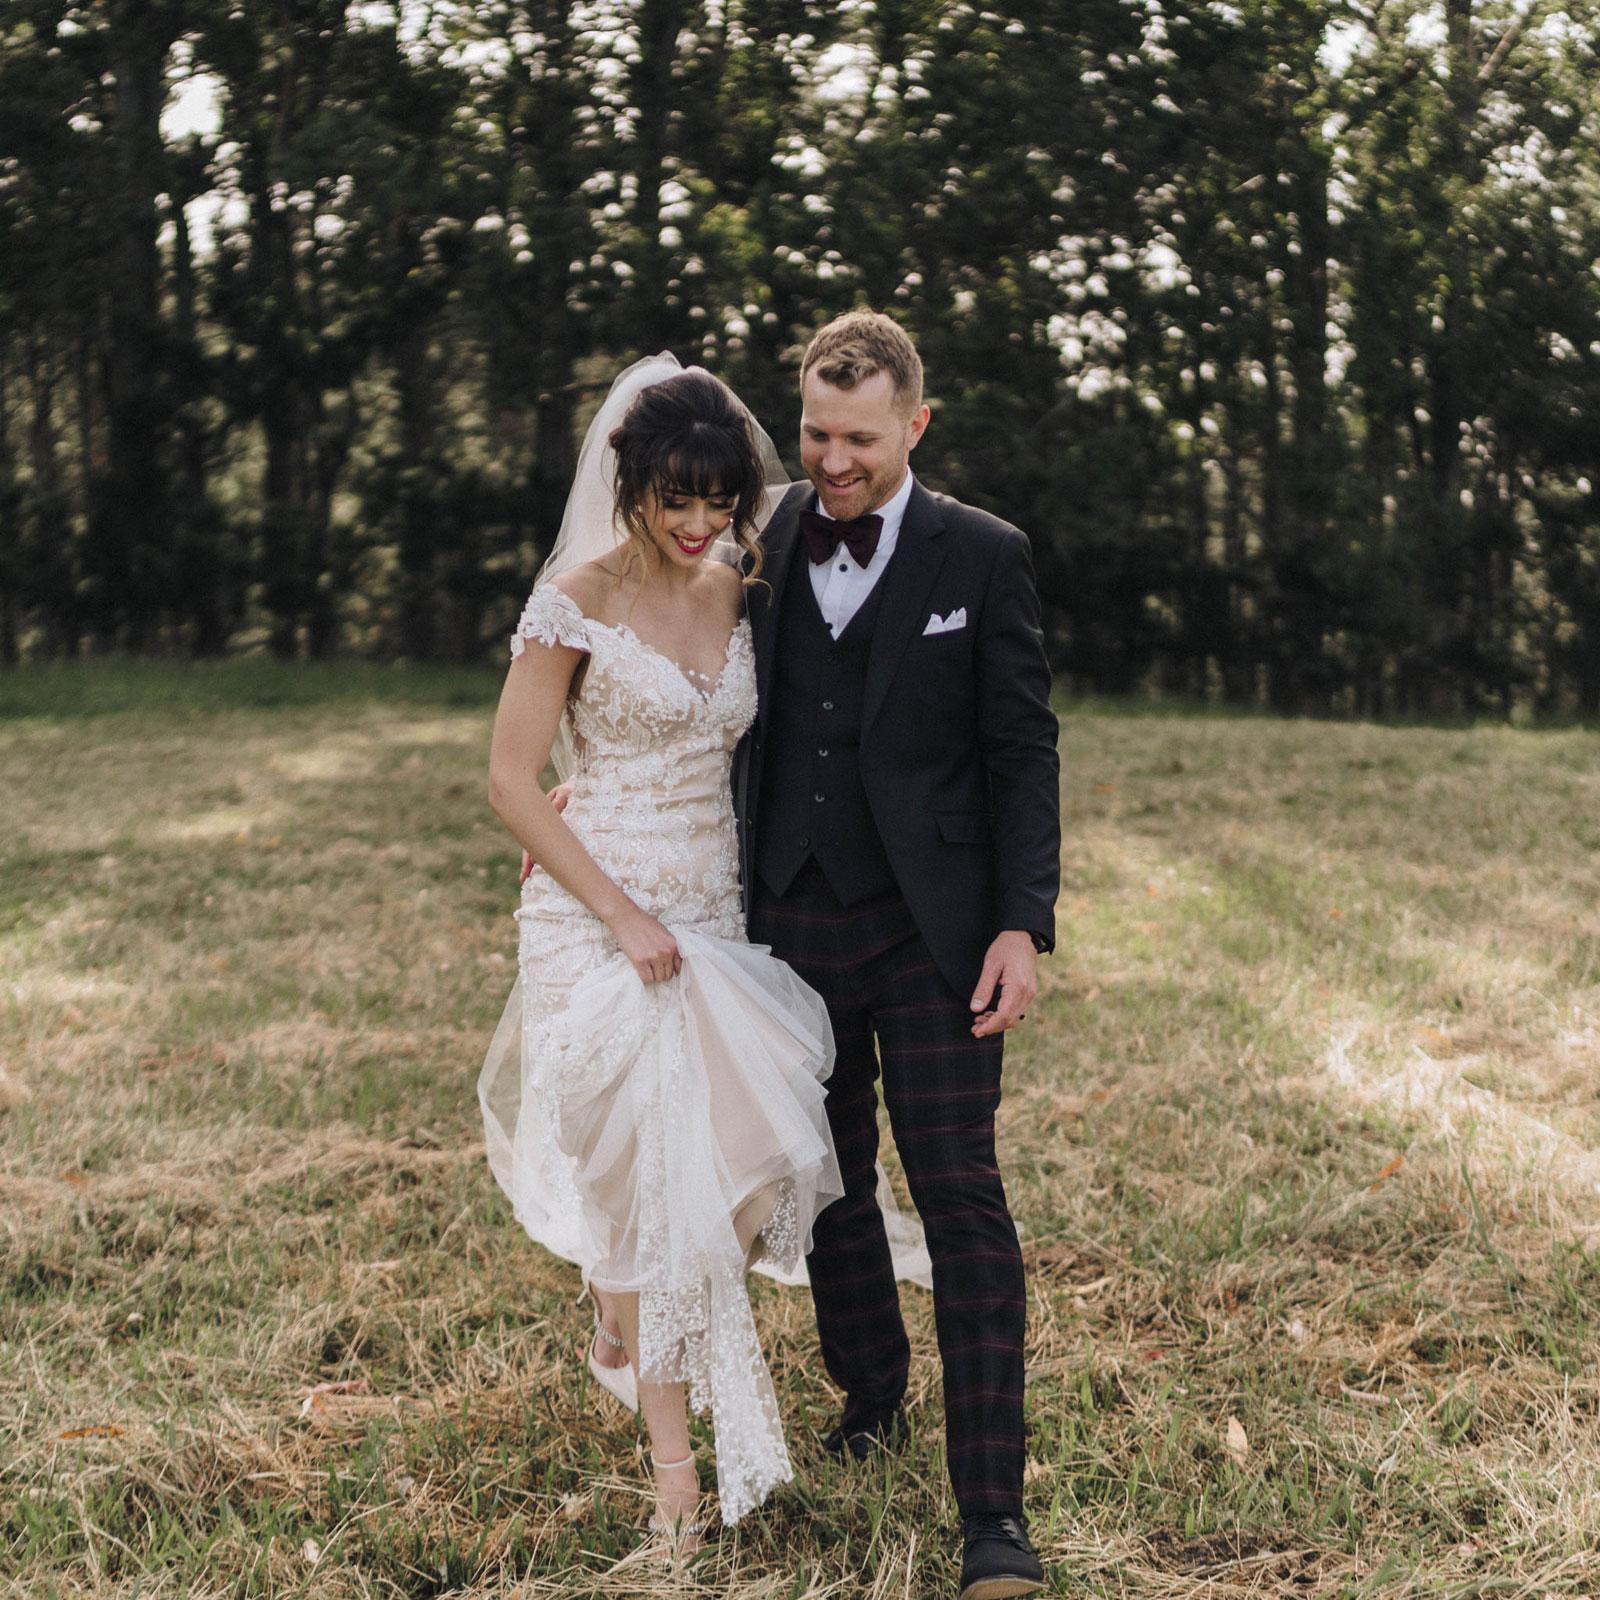 newfound-n-c-olive-tree-cottage-tauranga-wedding-photographer-830